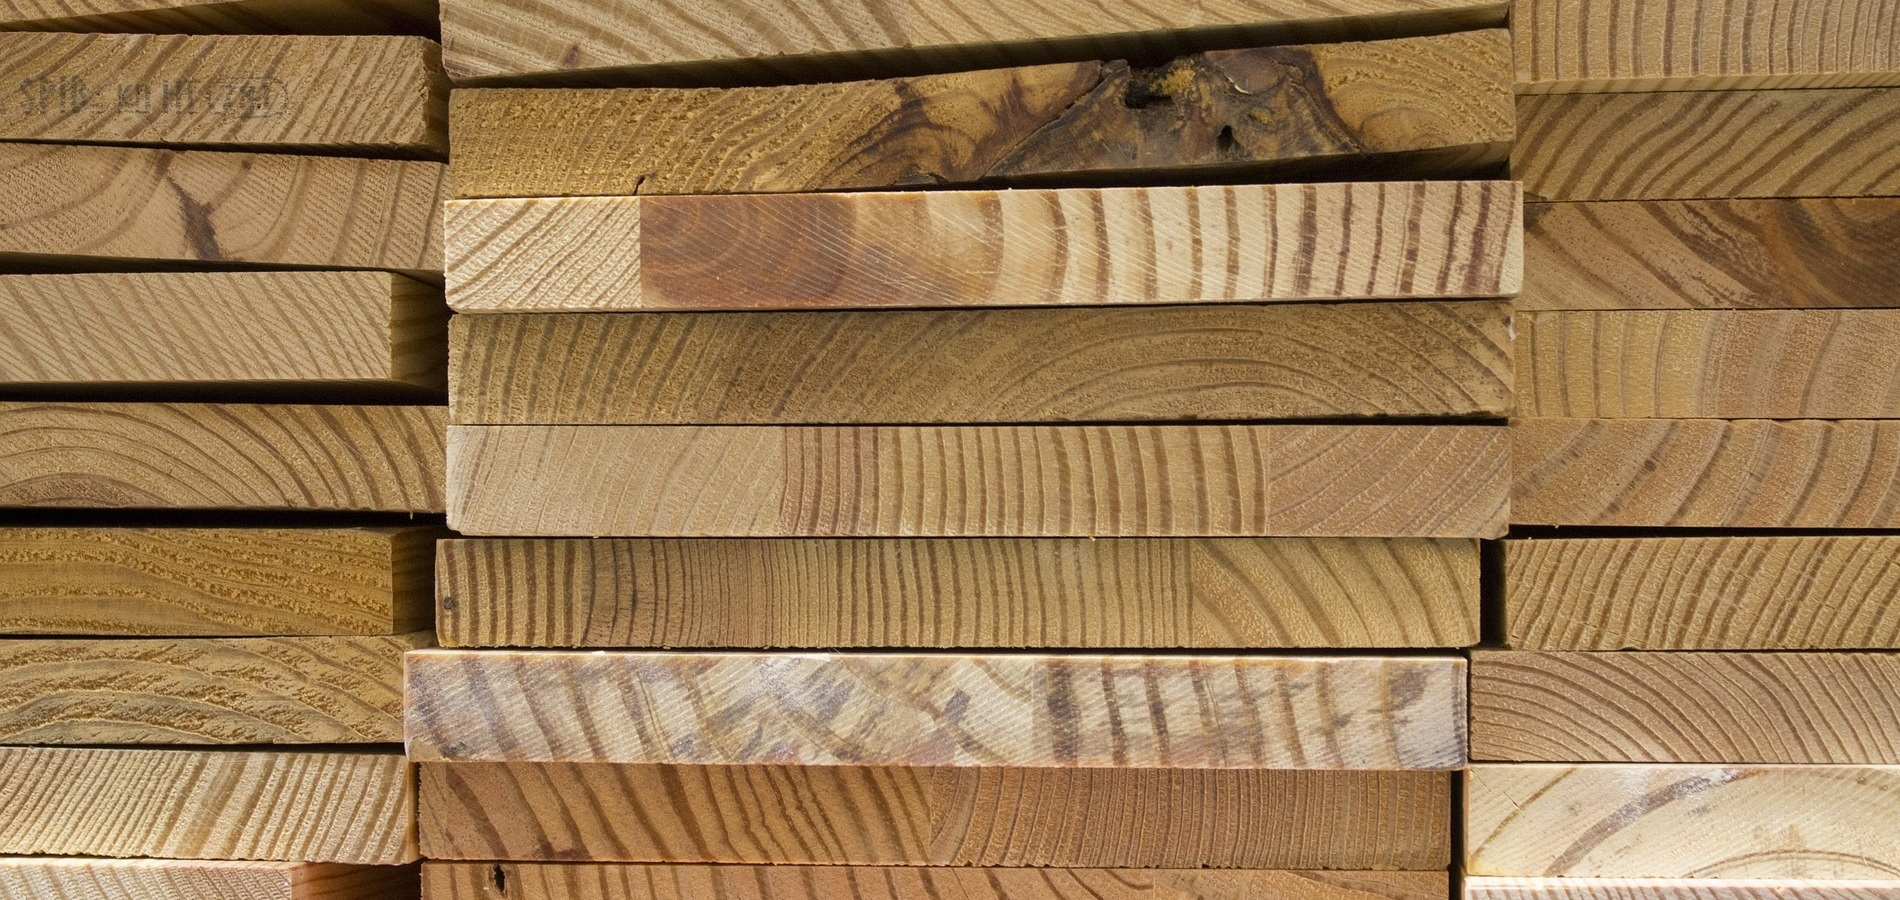 Timber Supplies | Timber Merchants | North West Timber Treatments Ltd